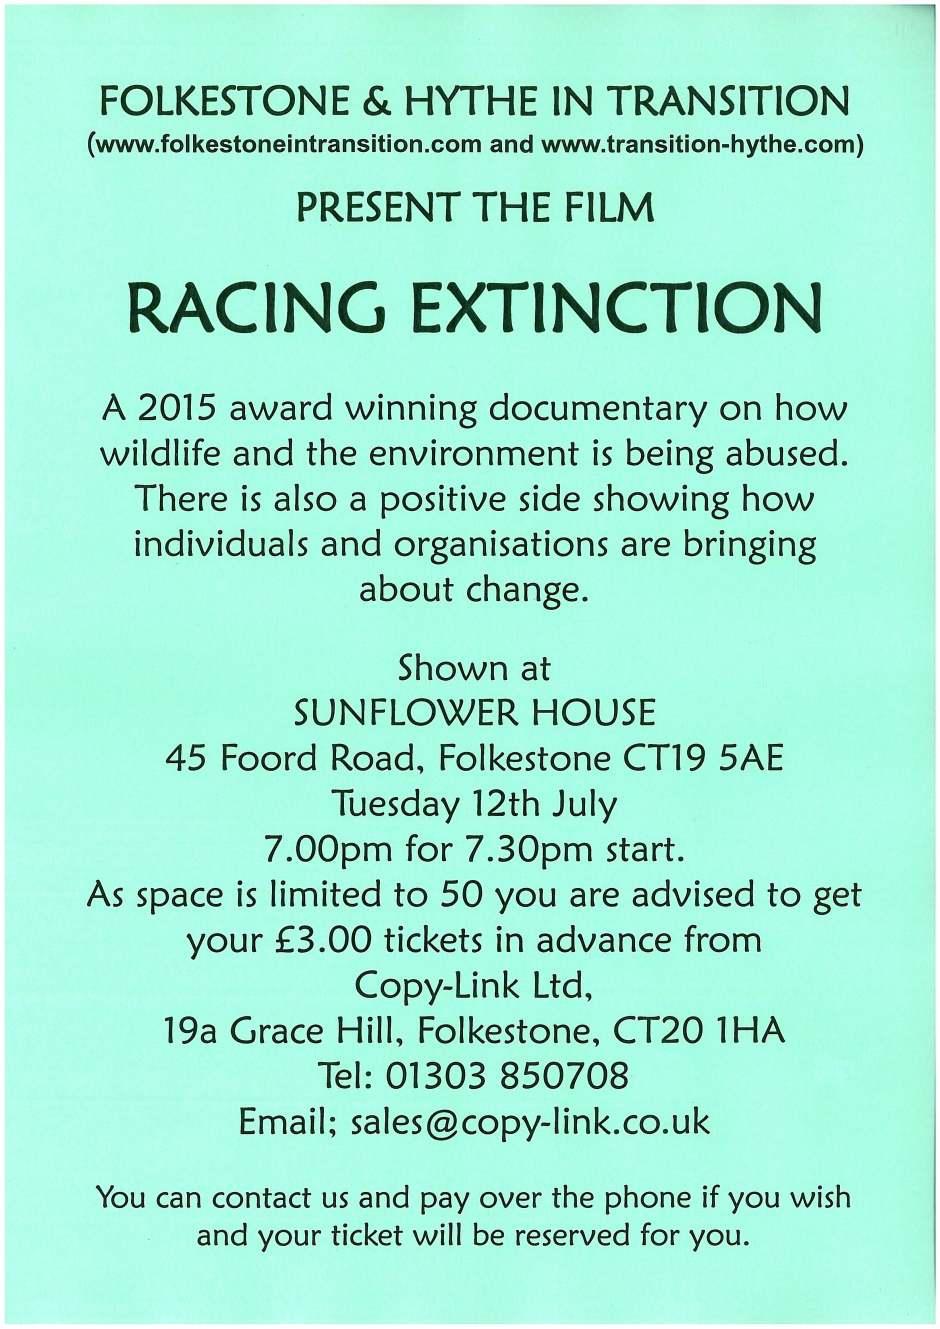 Folkestone, Hythe, Hythe In Transition, Folkestone In Transition, Sunflower House, Documentary, Film, Racing Extinction